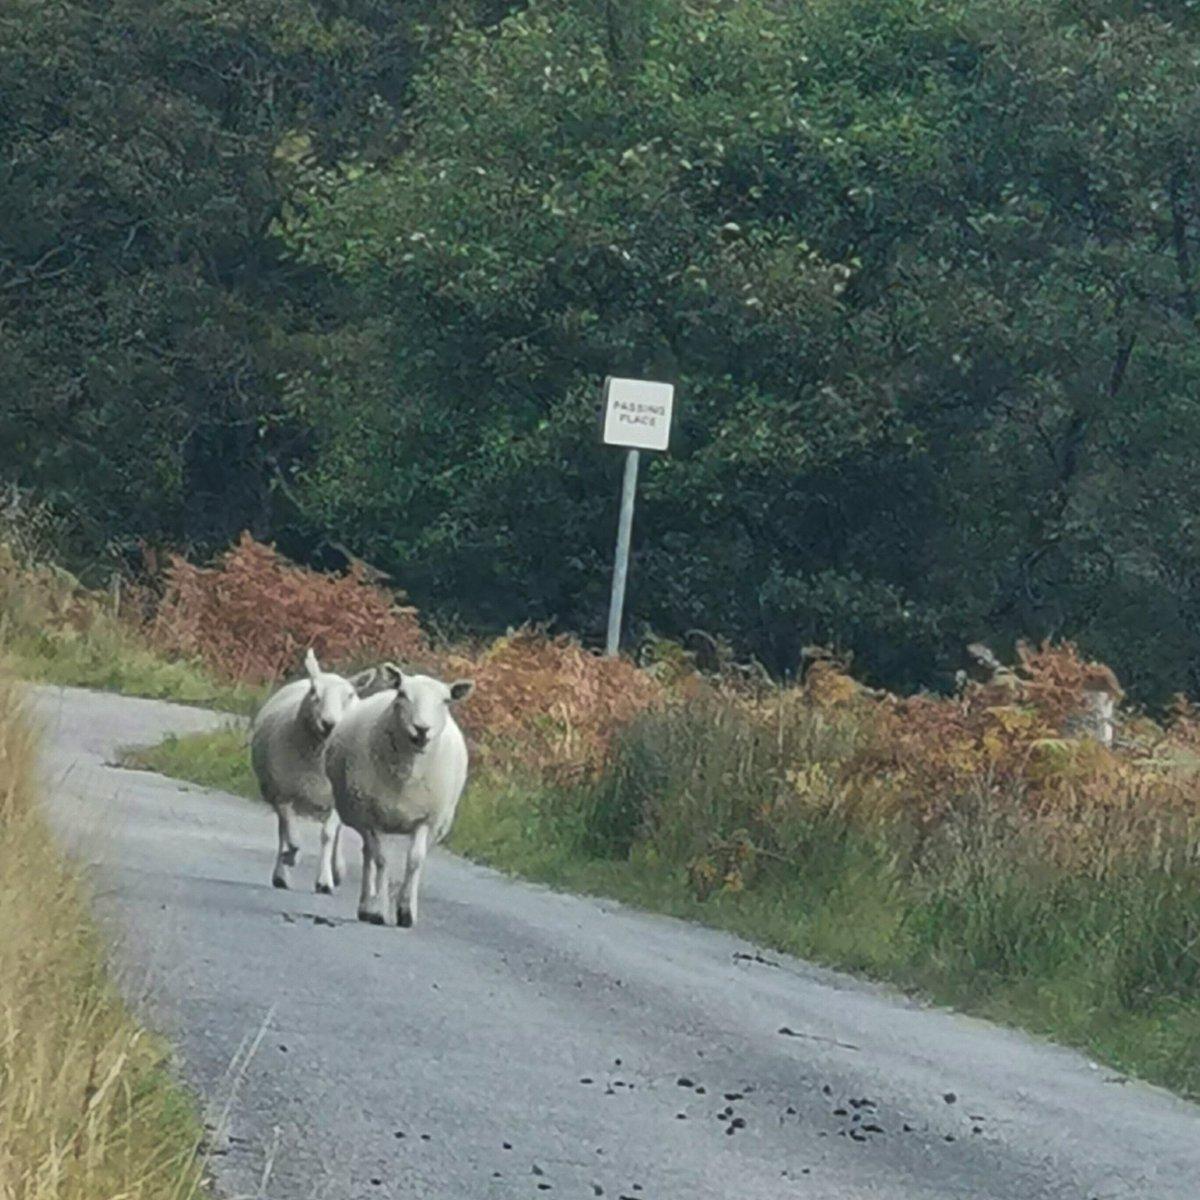 #roadhogs #Highlands #sheep #LoveWhereYouLive 😂🐑